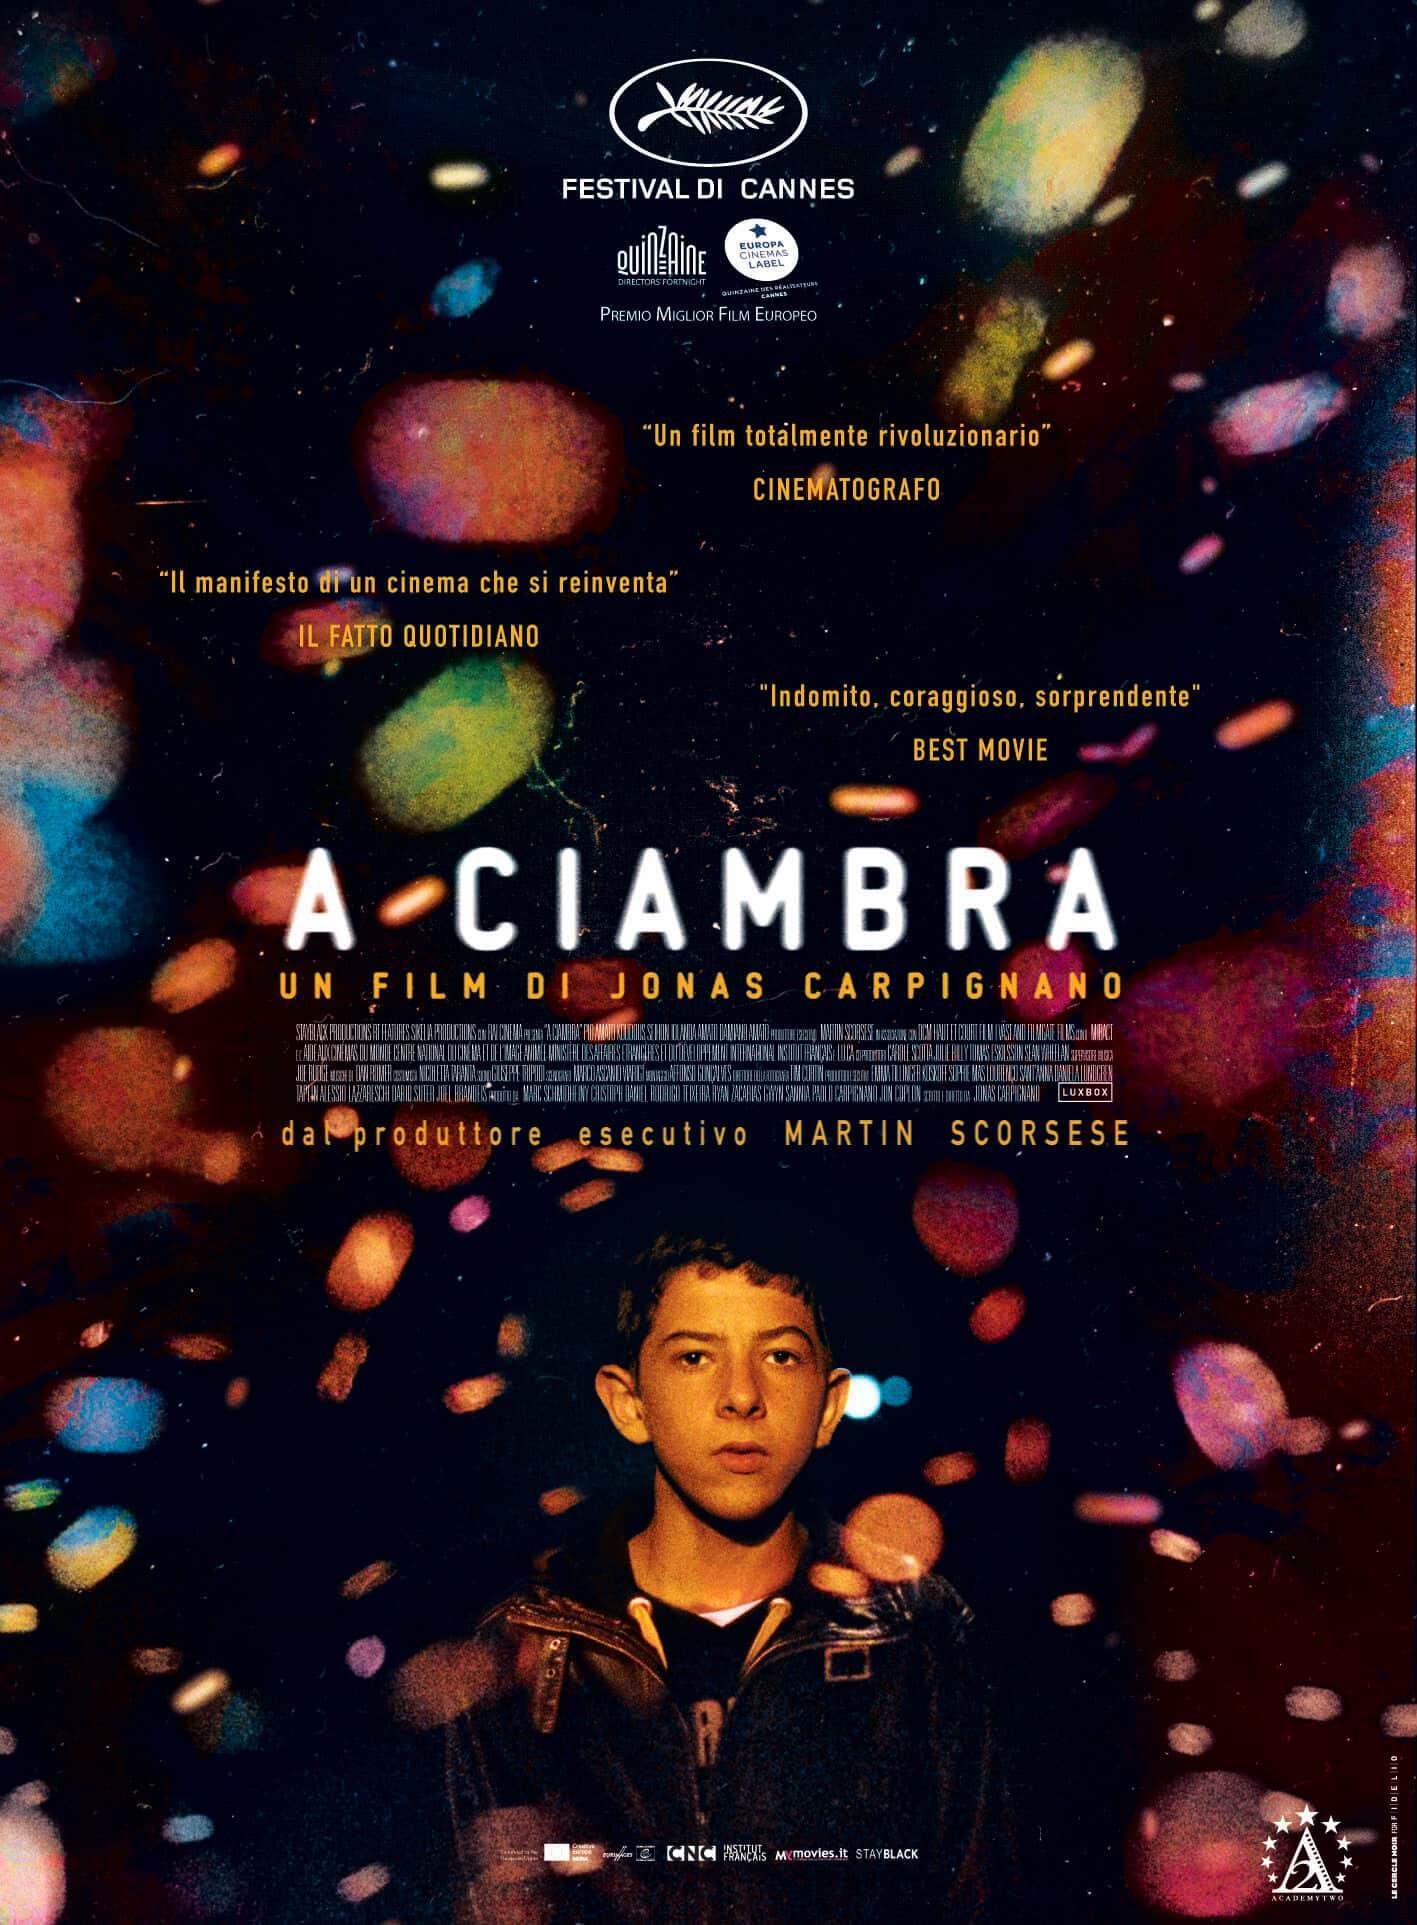 A Ciambra, I, BRA, F, D 2017, Jonas Carpignano